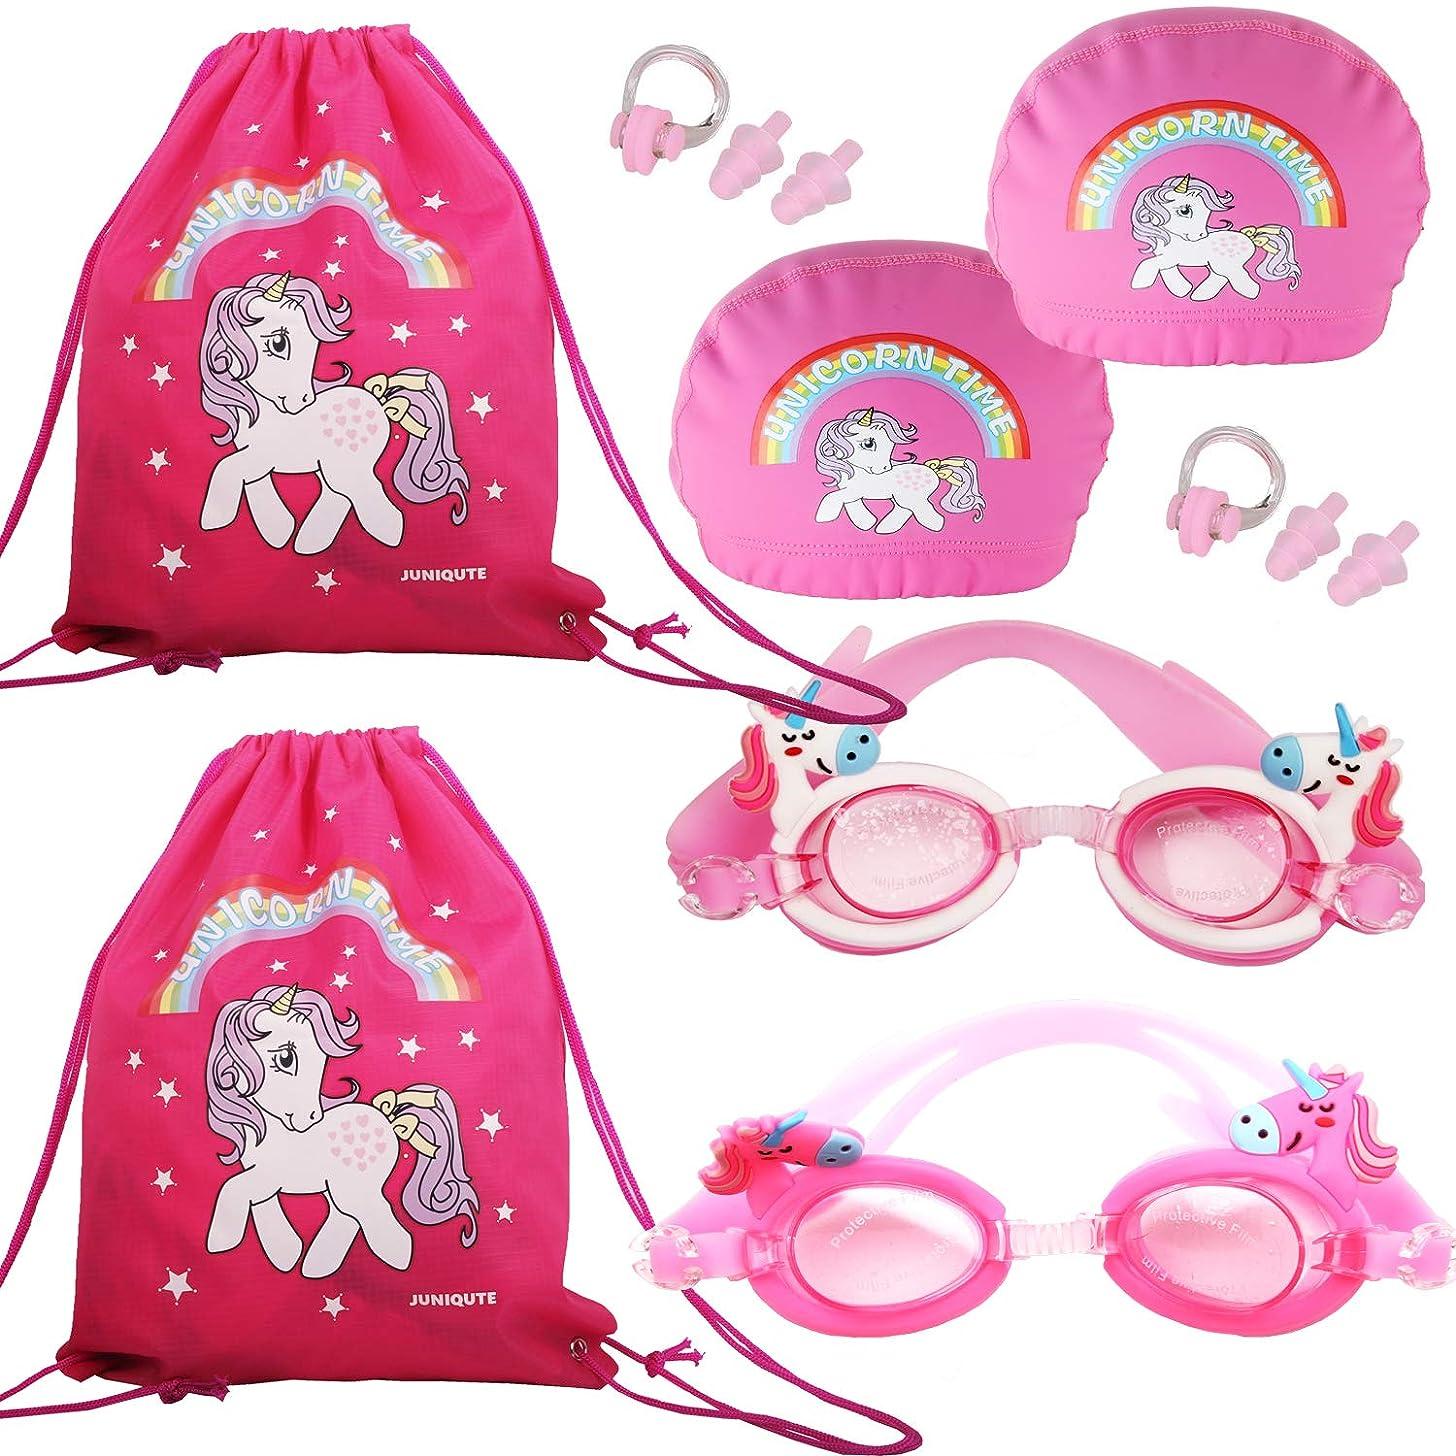 Pack of 6, 2PCS Kids Unicorn Swim Goggles, 2PCS Unicorn Breathe Swim Cap-Sun Protection Hat, 2PCS Unicorn Bags, Glasses for Girls and Teens from3 to15 Years, Anti-Fog, Waterproof, UV Protection